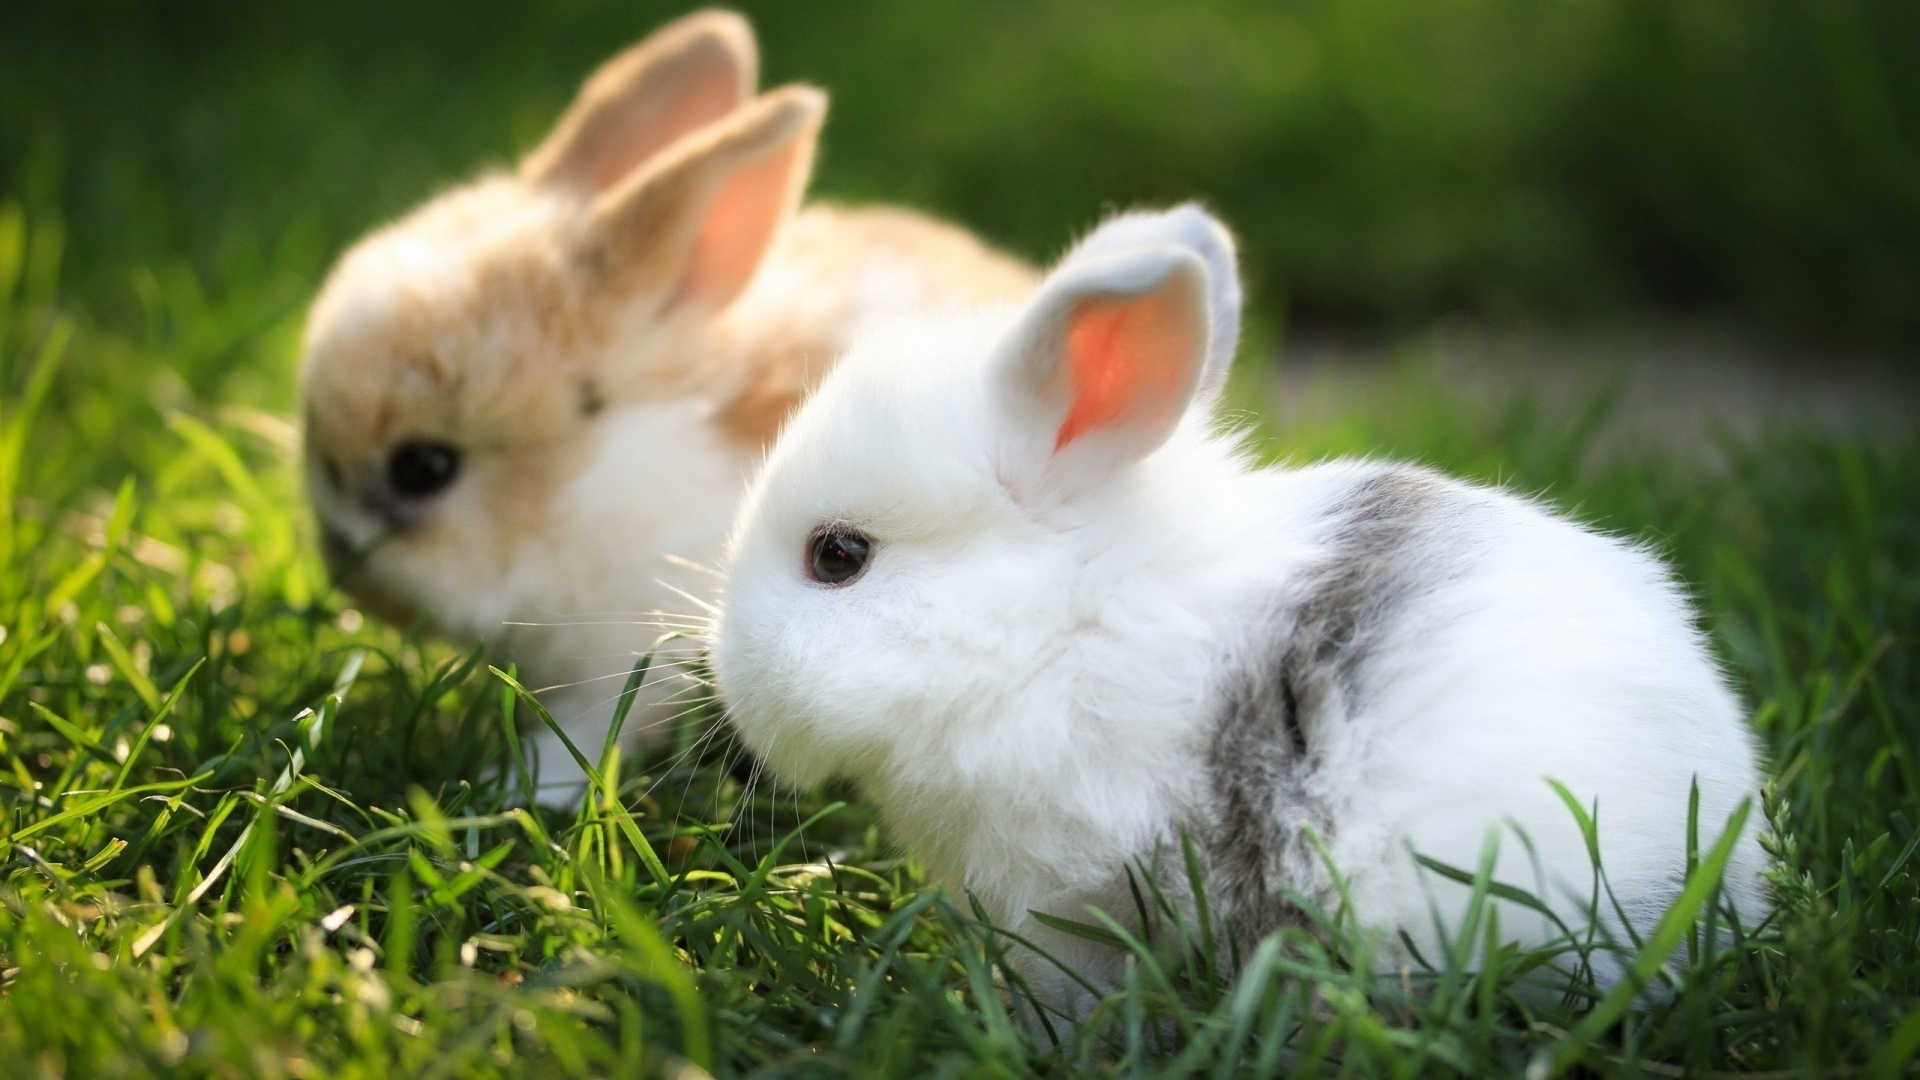 rabbit download wallpaper